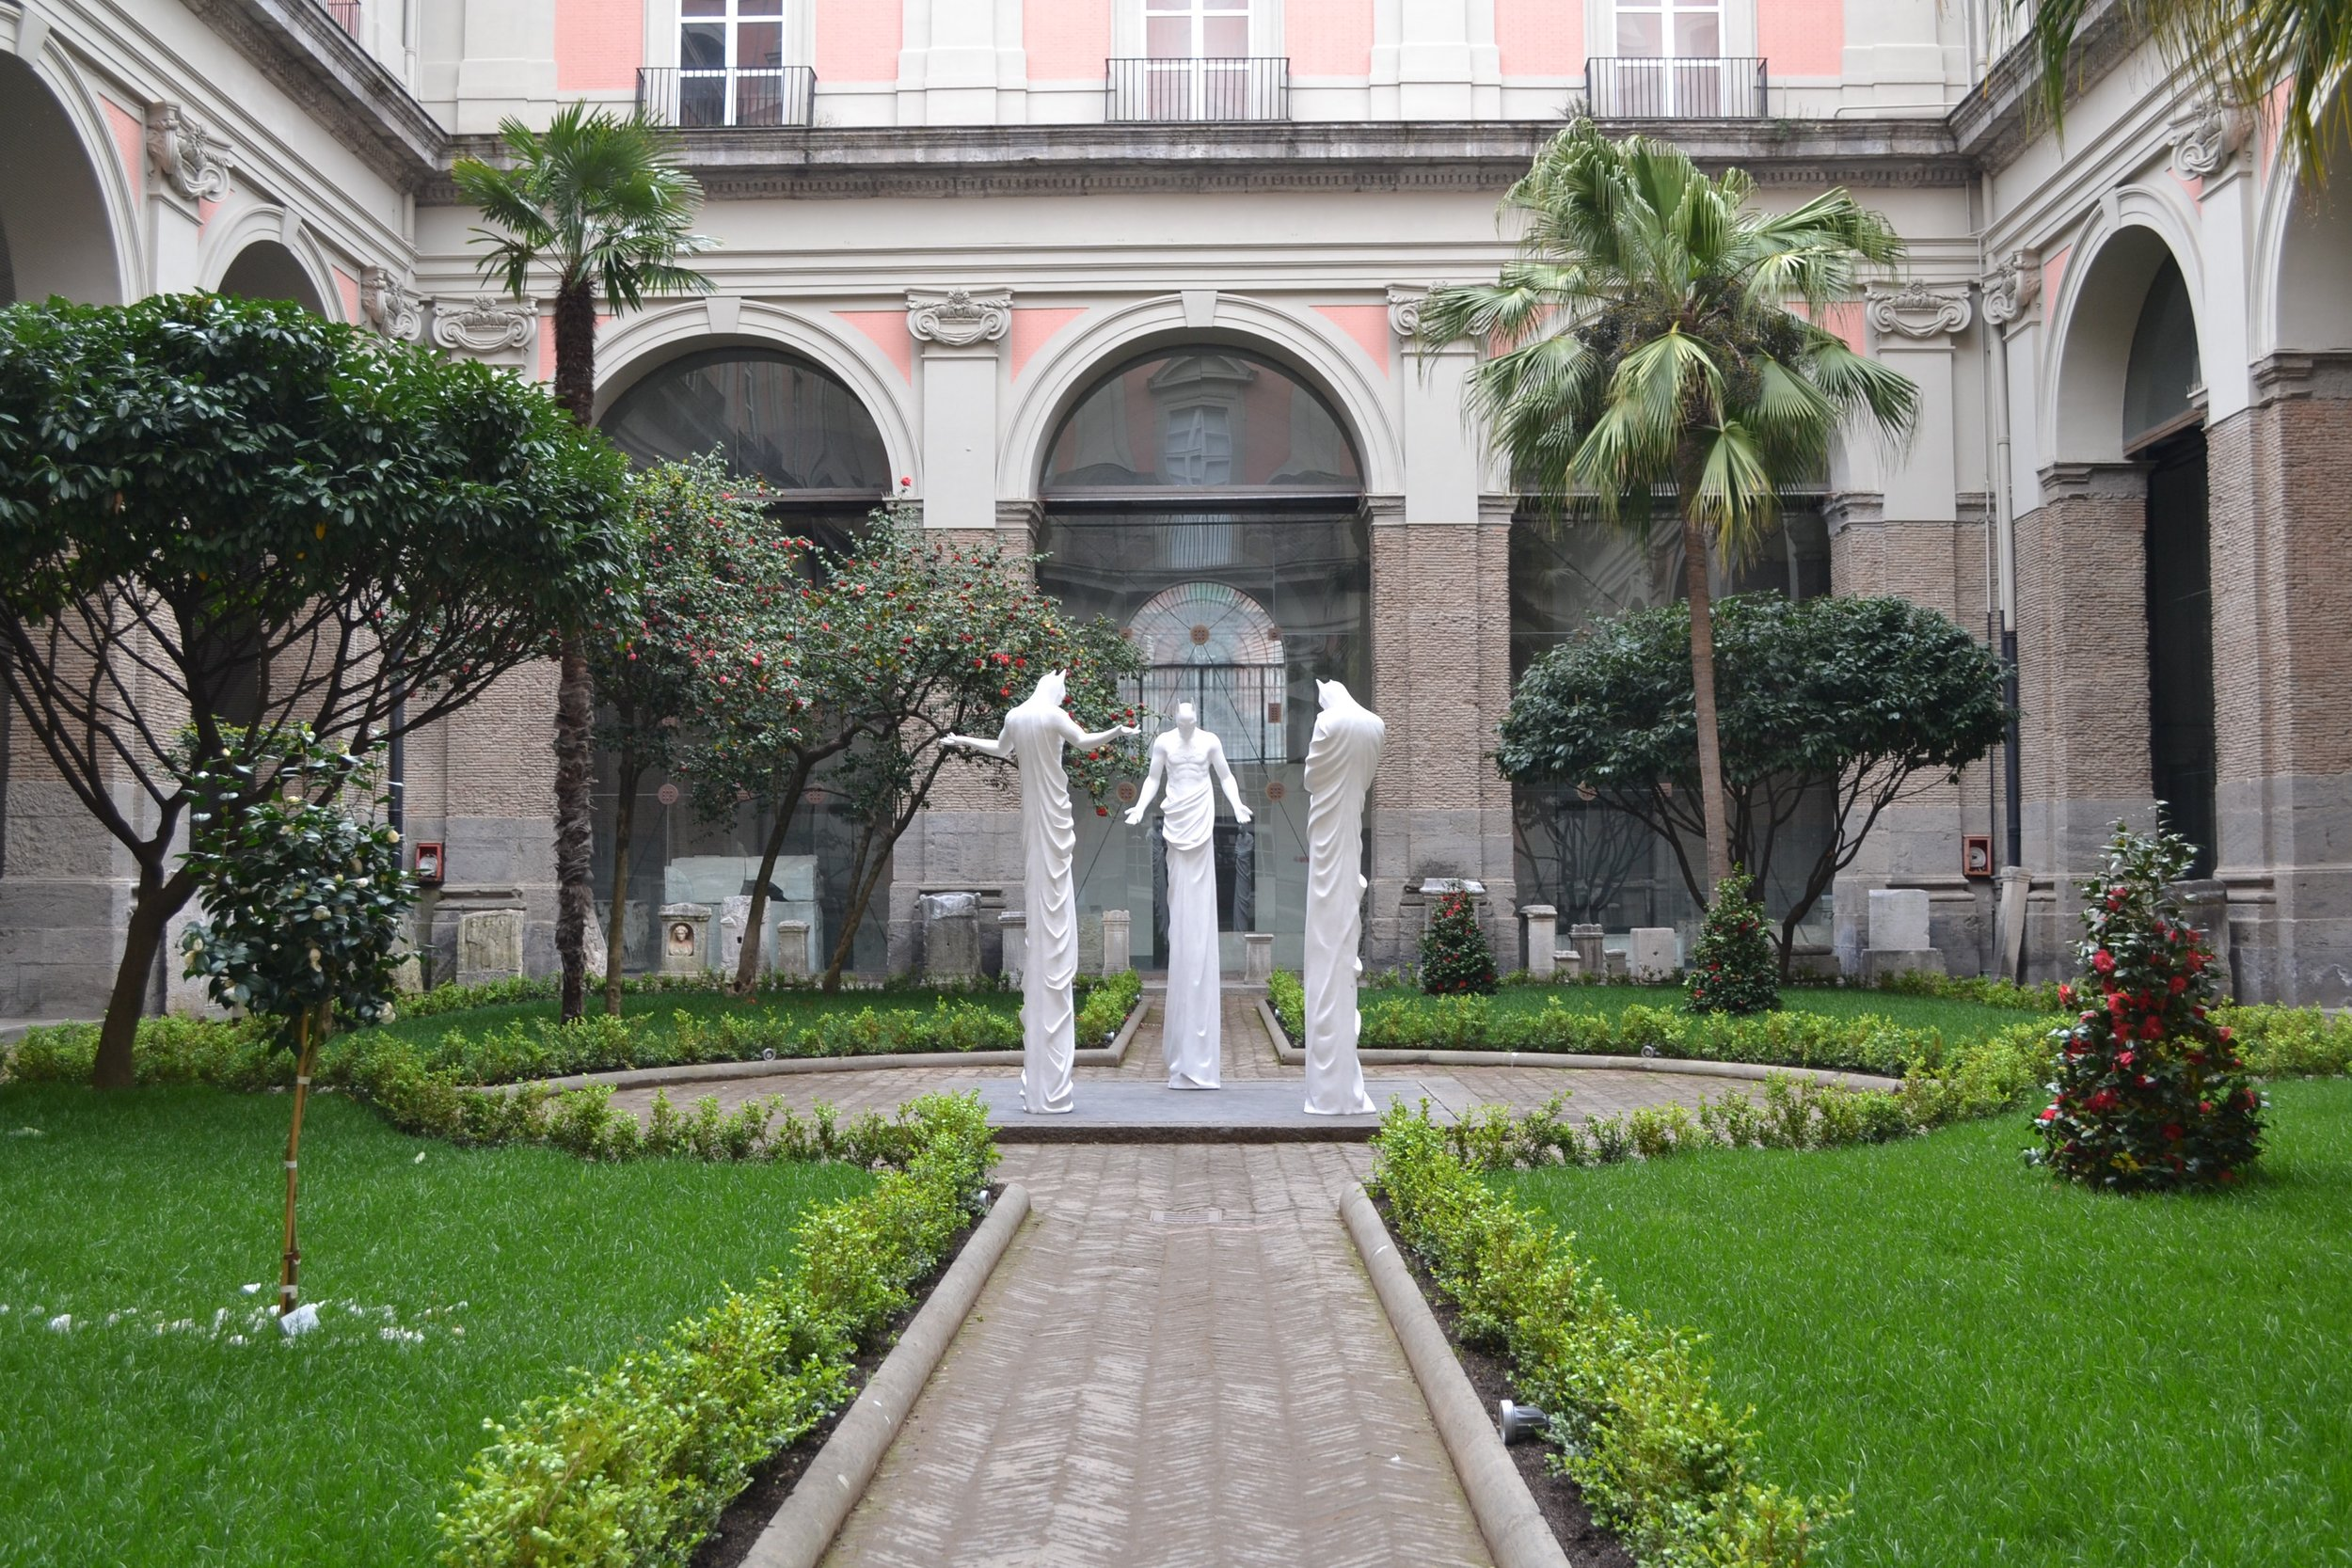 In Excelsis , 2013 . MANN - Museo Archeologico Nazionale di Napoli, Naples 2016. Installation view. Photo: Studio Adrian Tranquilli